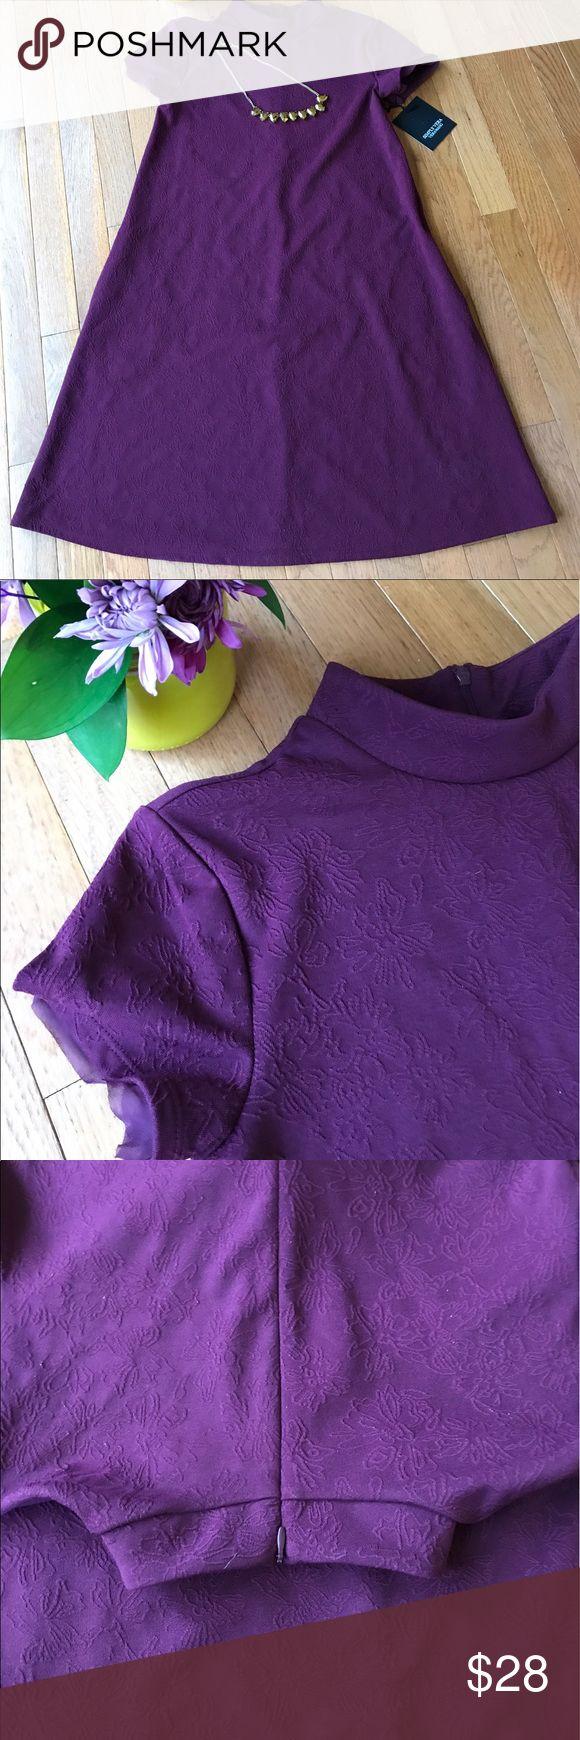 Simply Vera - Vera Wang Dress with Pockets Simply Vera - Vera Wang Dress with Pockets - Size: XS - Color: Grape Wine - Zippered Back - NEW Simply Vera Vera Wang Dresses Midi